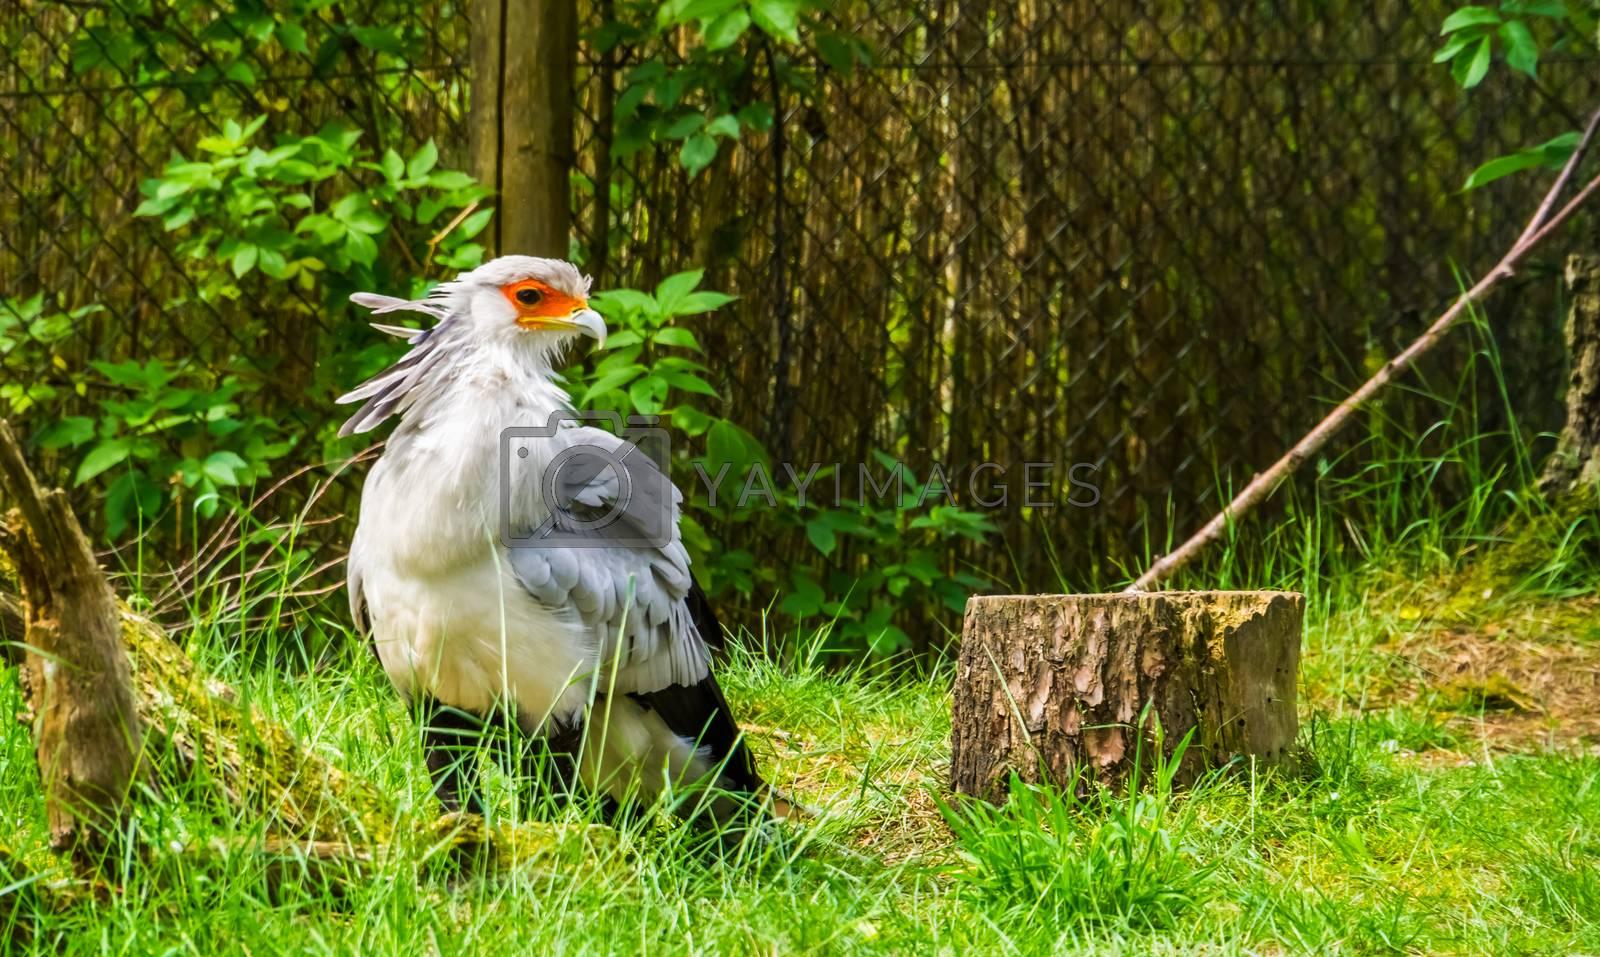 secretary bird in closeup, bird of prey from Africa, vulnerable animal specie